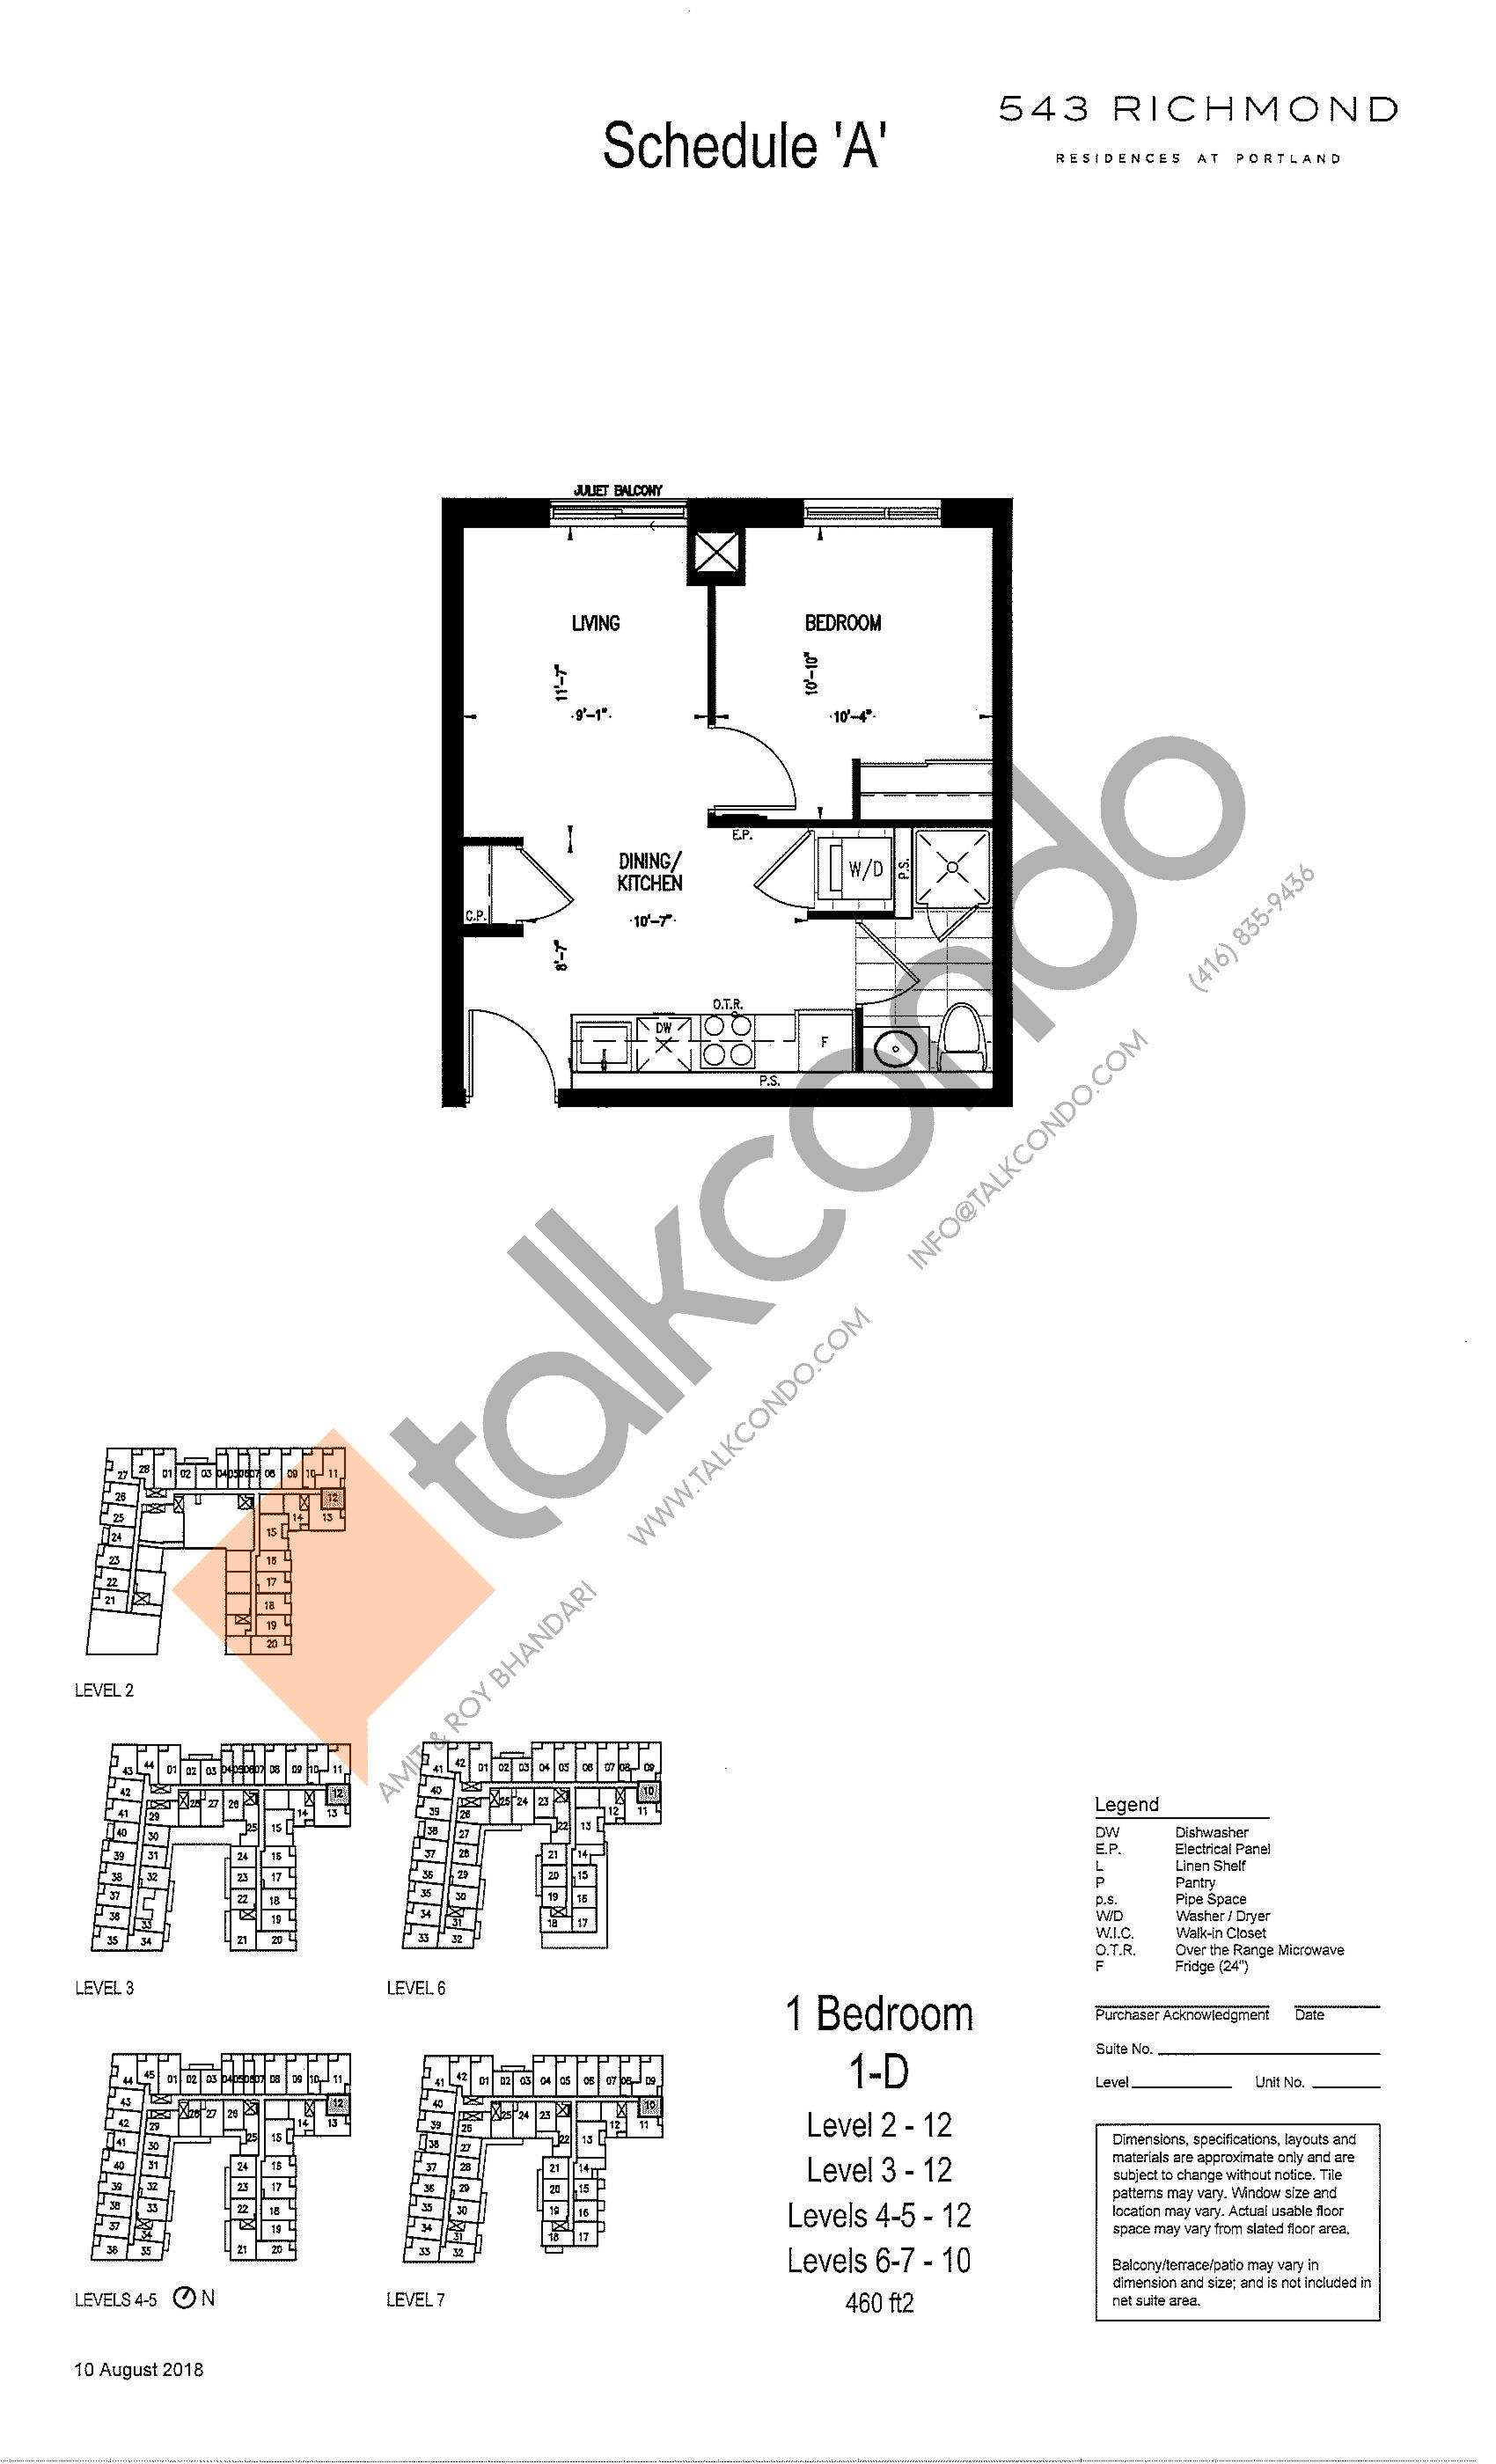 1-D Floor Plan at 543 Richmond St Condos - 460 sq.ft